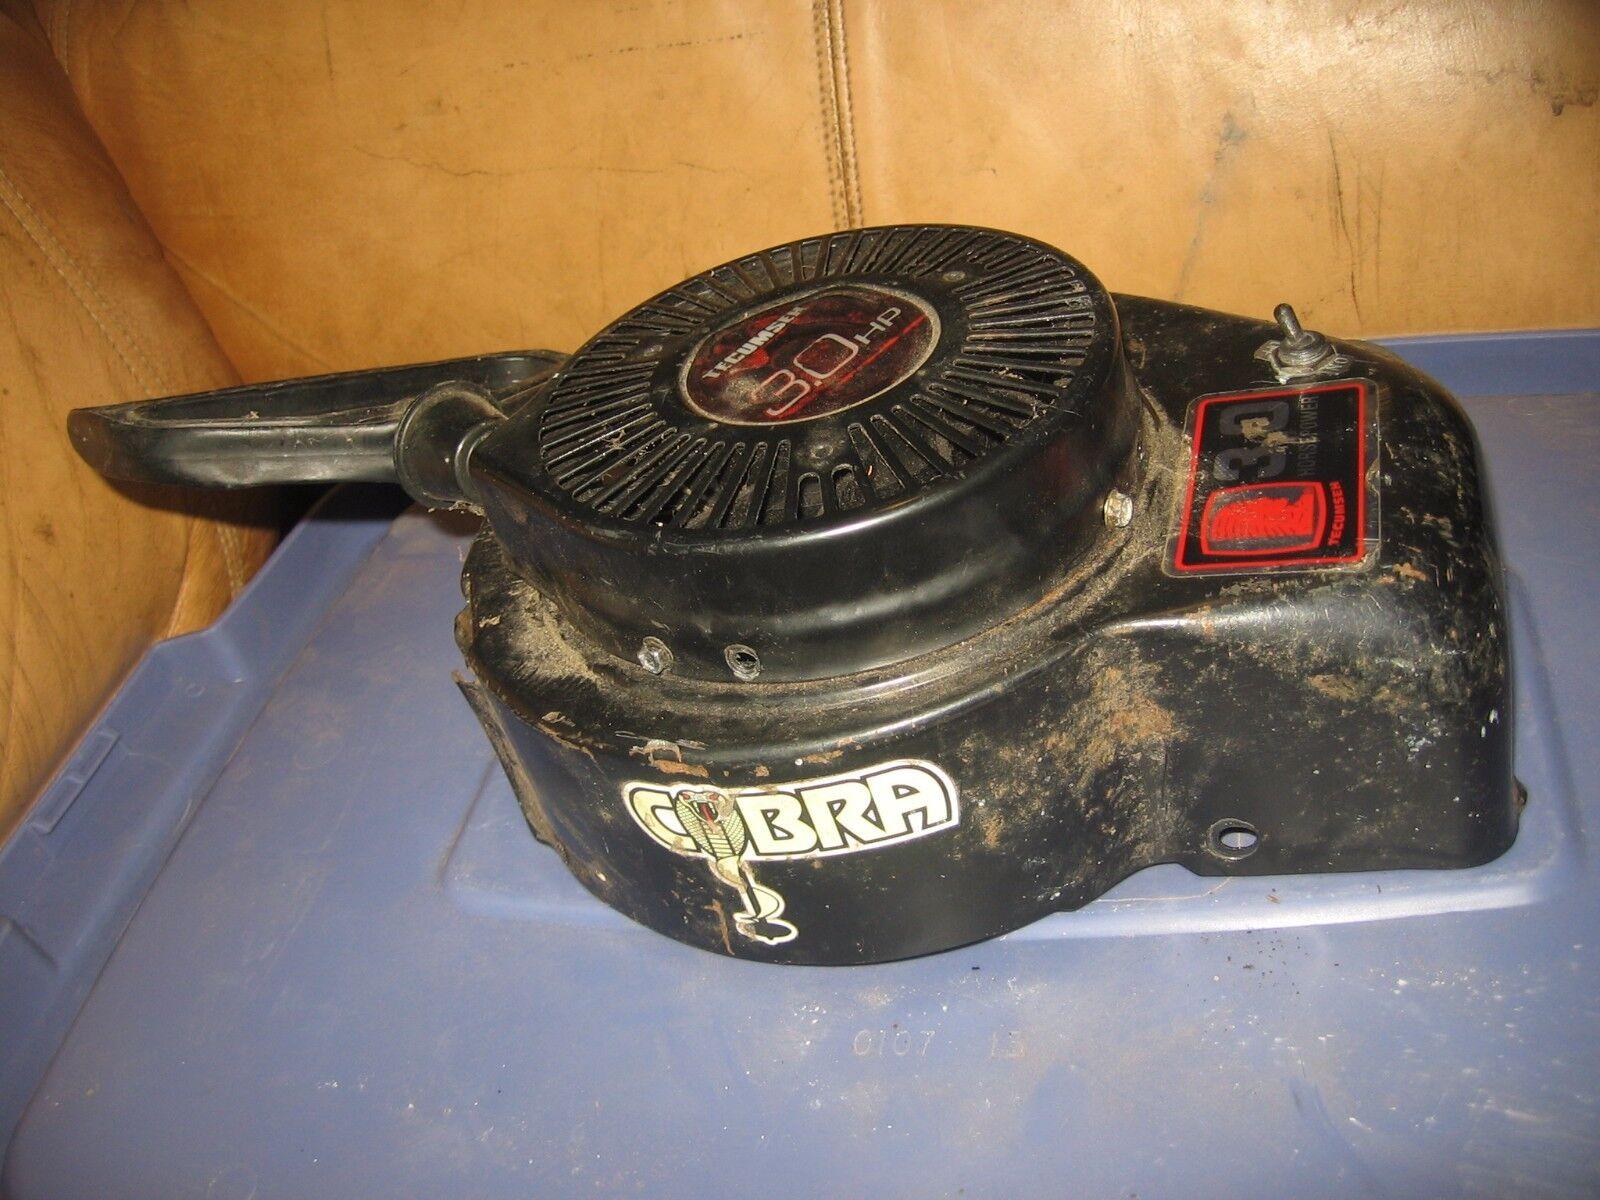 Strikemaster tecumesh Cobra 3.0 hp recoil  ice auger part